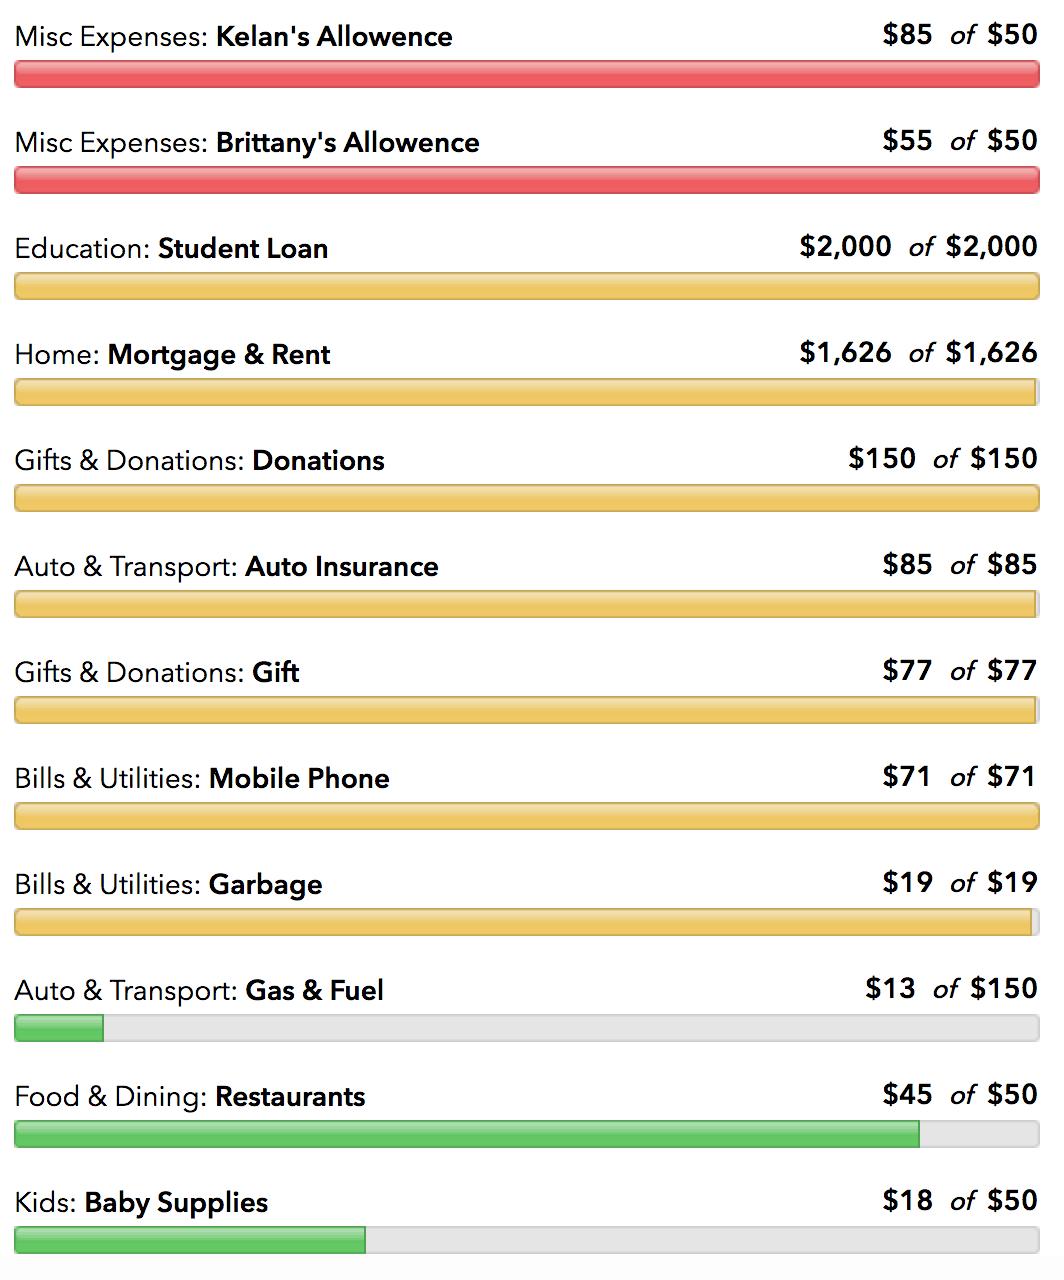 Mint budgeting app screenshot of expense categories